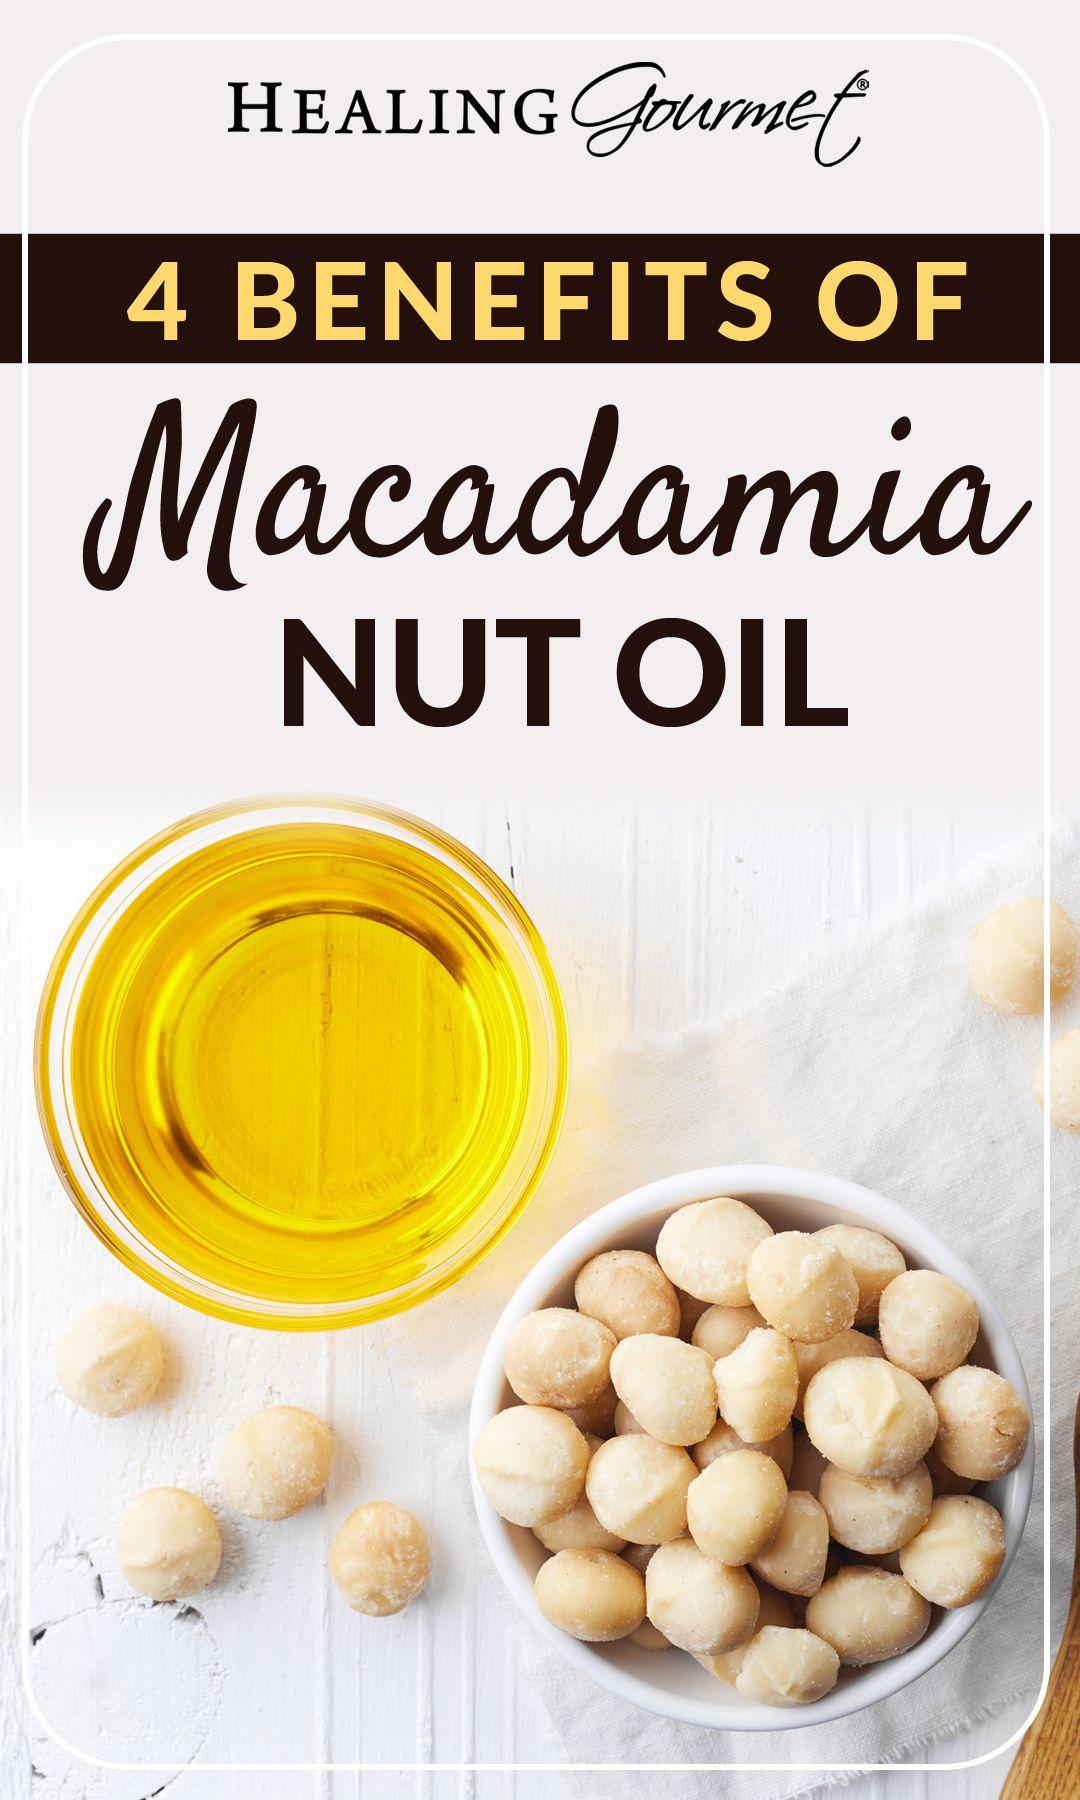 The Health Benefits Of Macadamia Nut Oil Macadamia Nut Oil Health And Nutrition Macadamia Nuts